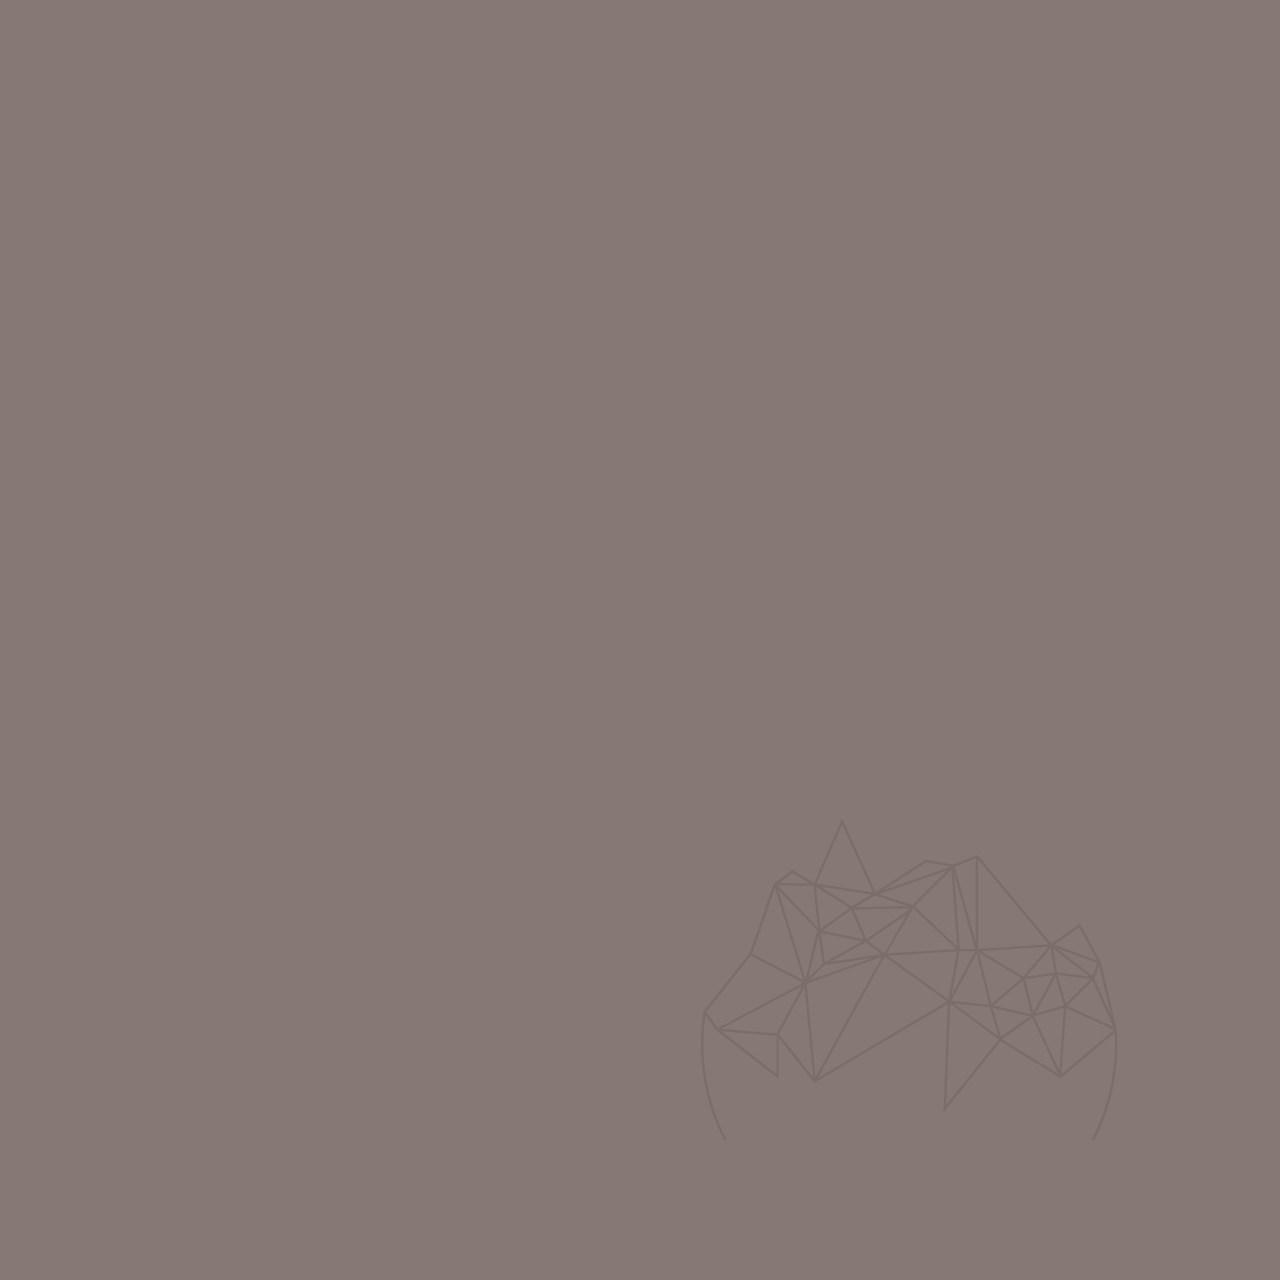 Weber Color Perfect Manhattan 2 KG - Flexible wall & floor grout title=Weber Color Perfect Manhattan 2 KG - Flexible wall & floor grout